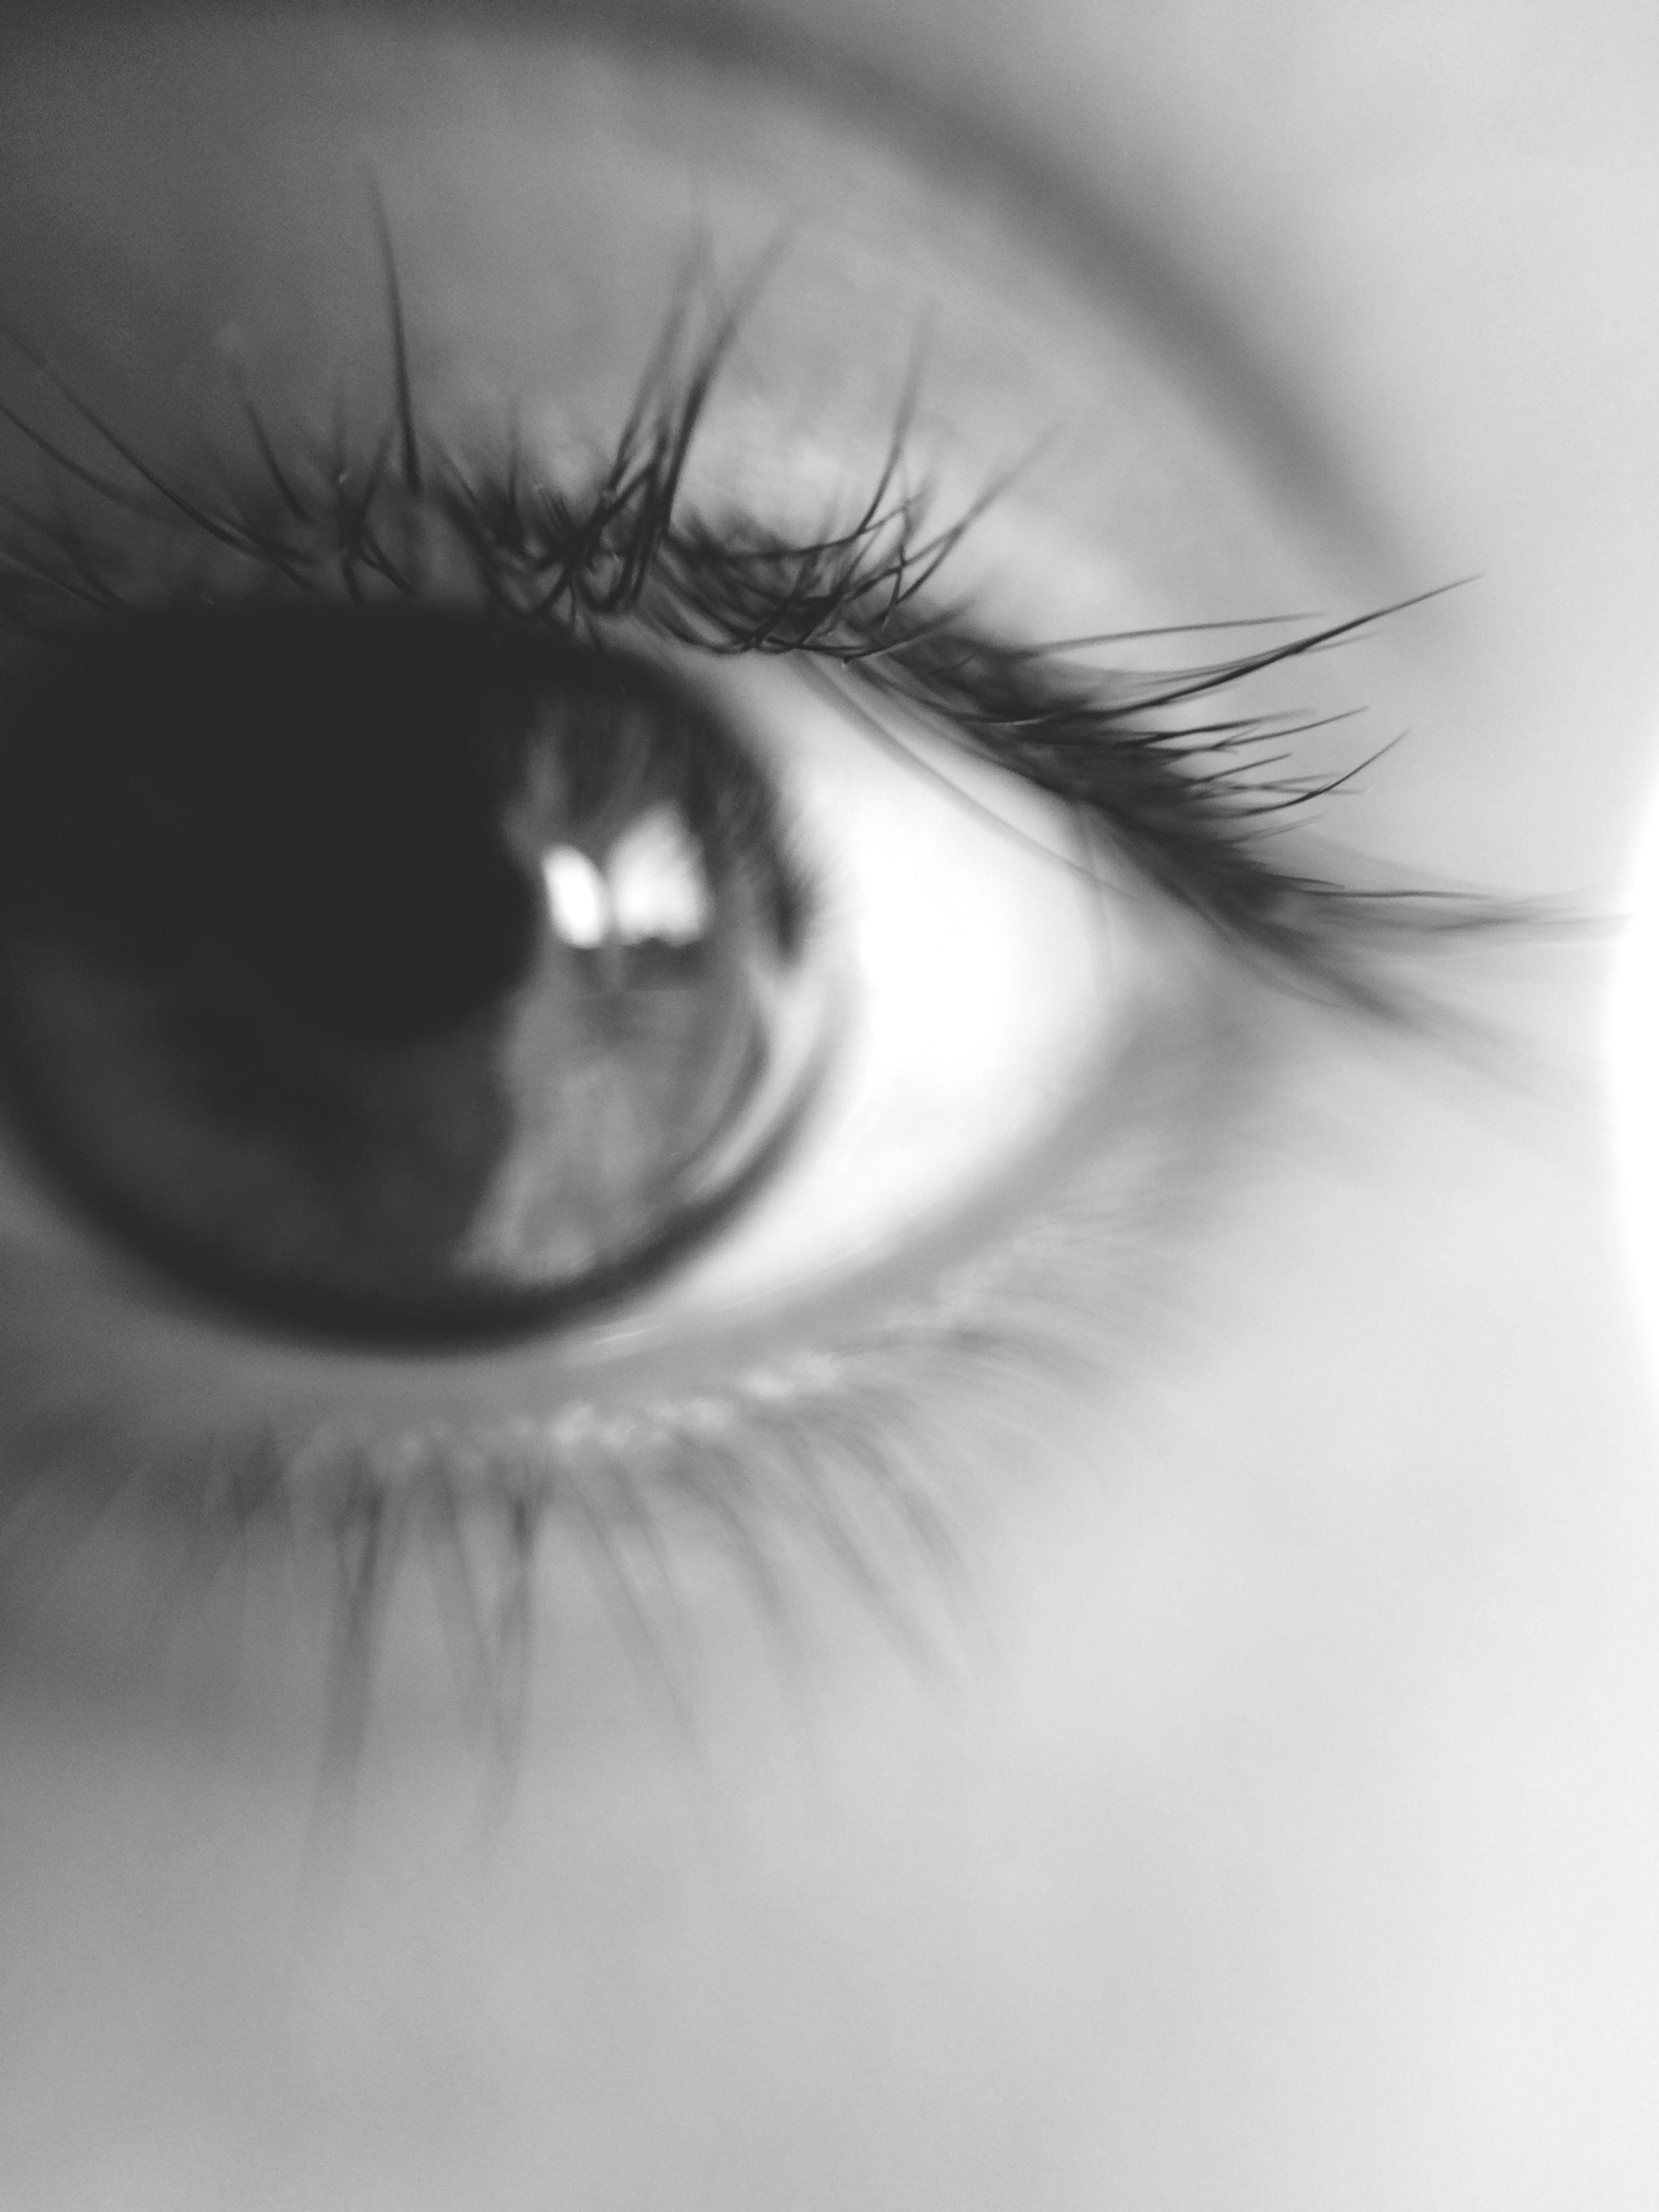 close-up, human eye, eyelash, part of, extreme close-up, eyesight, human skin, sensory perception, extreme close up, eyeball, cropped, person, iris - eye, indoors, selective focus, studio shot, detail